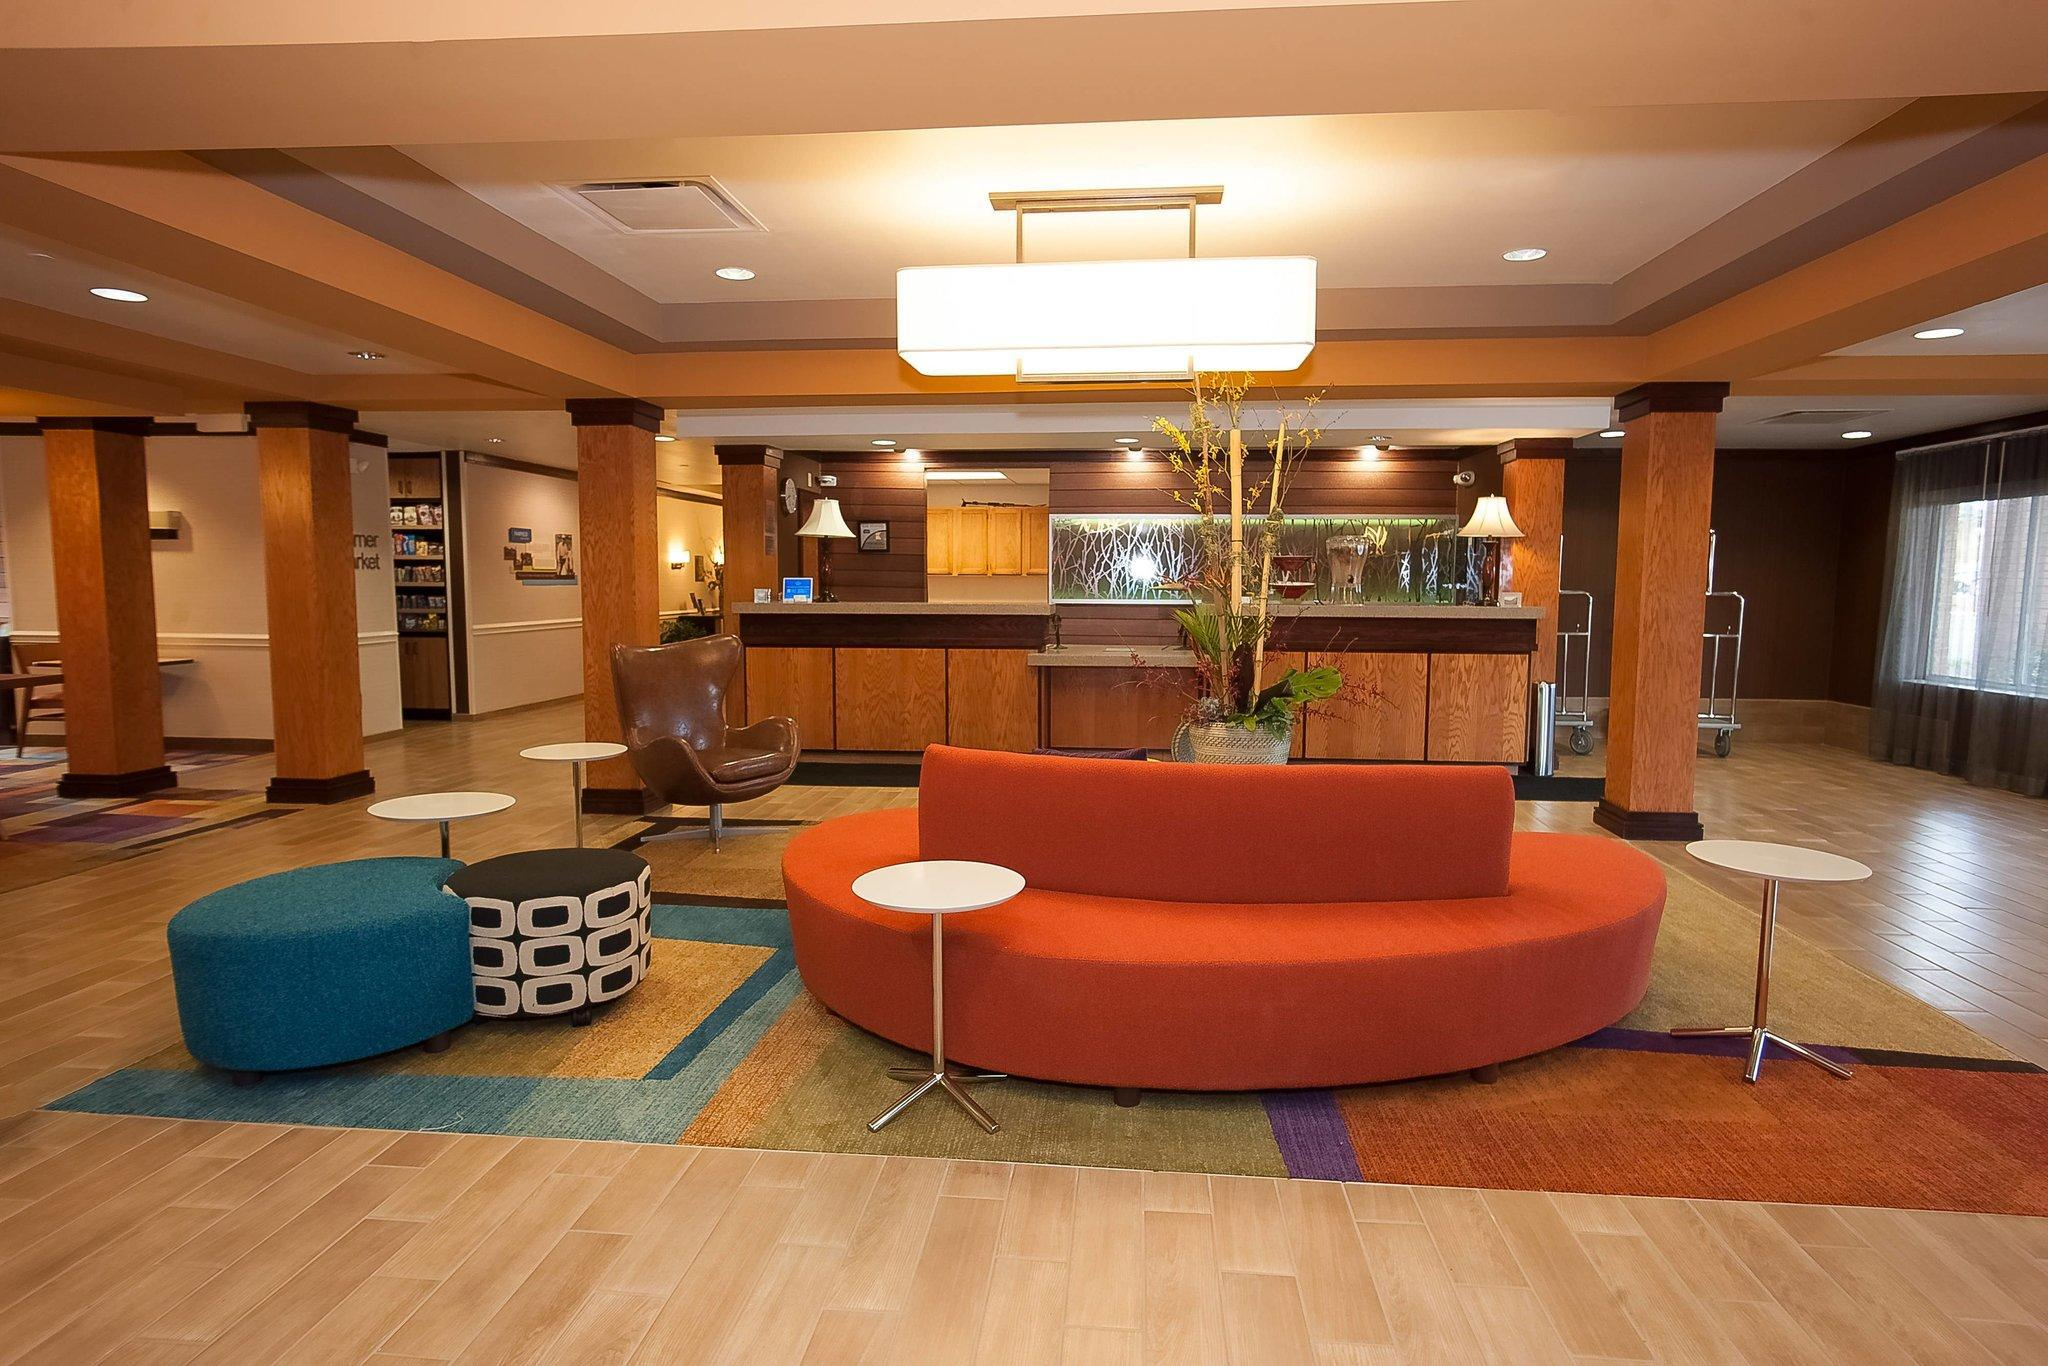 Fairfield Inn And Suites Akron South